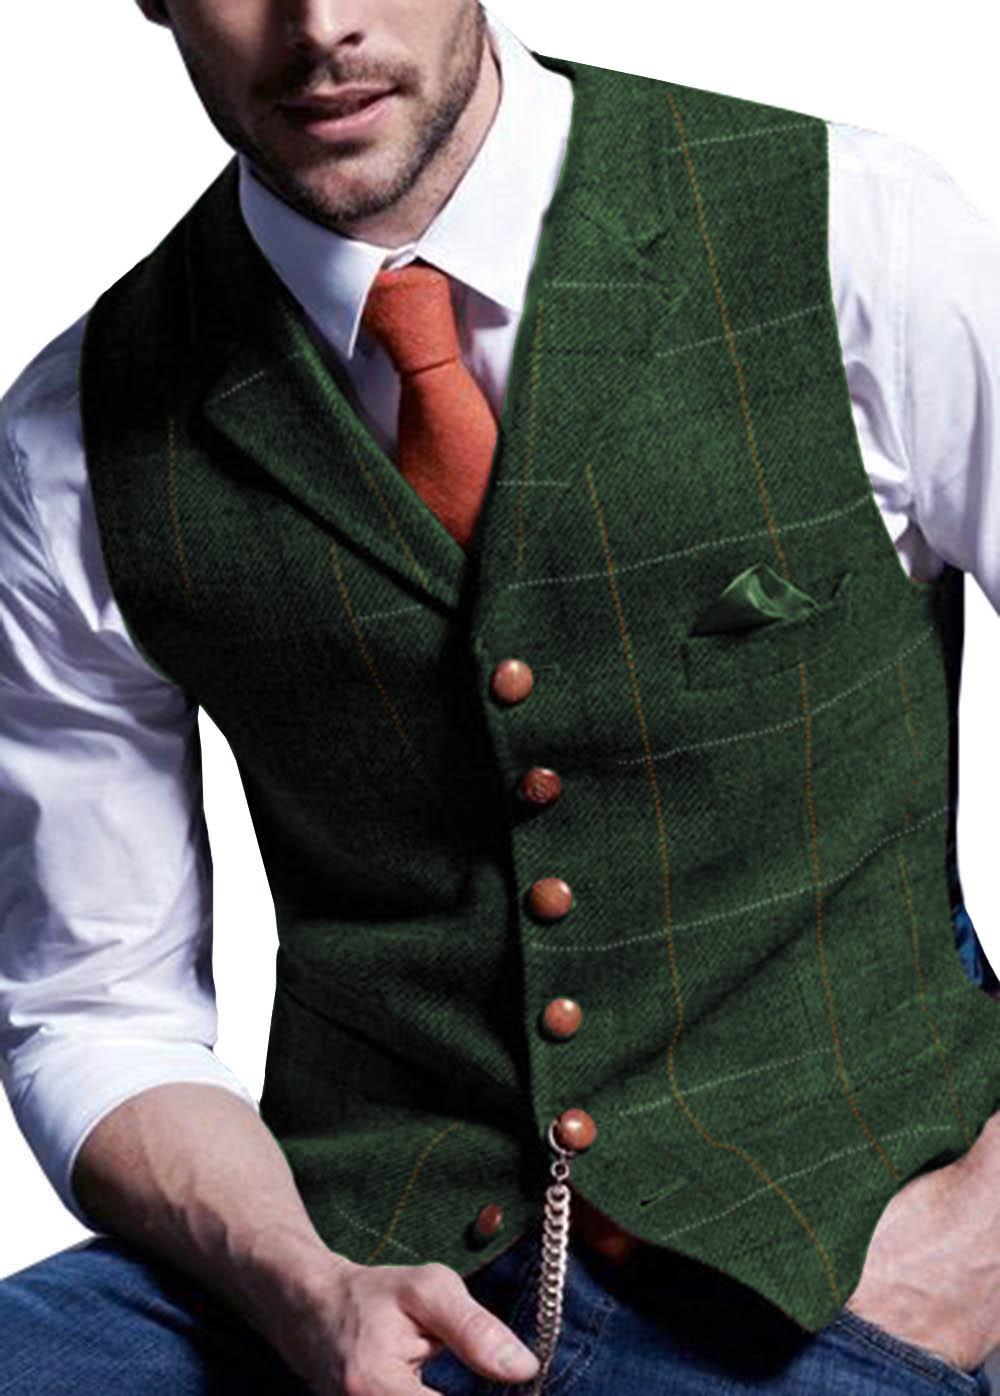 Solove-Suit Gilet da Uomo Classico in Tweed Gilet a Spina di Pesce Slim Fit Collo a U per Groomsmen Matrimonio